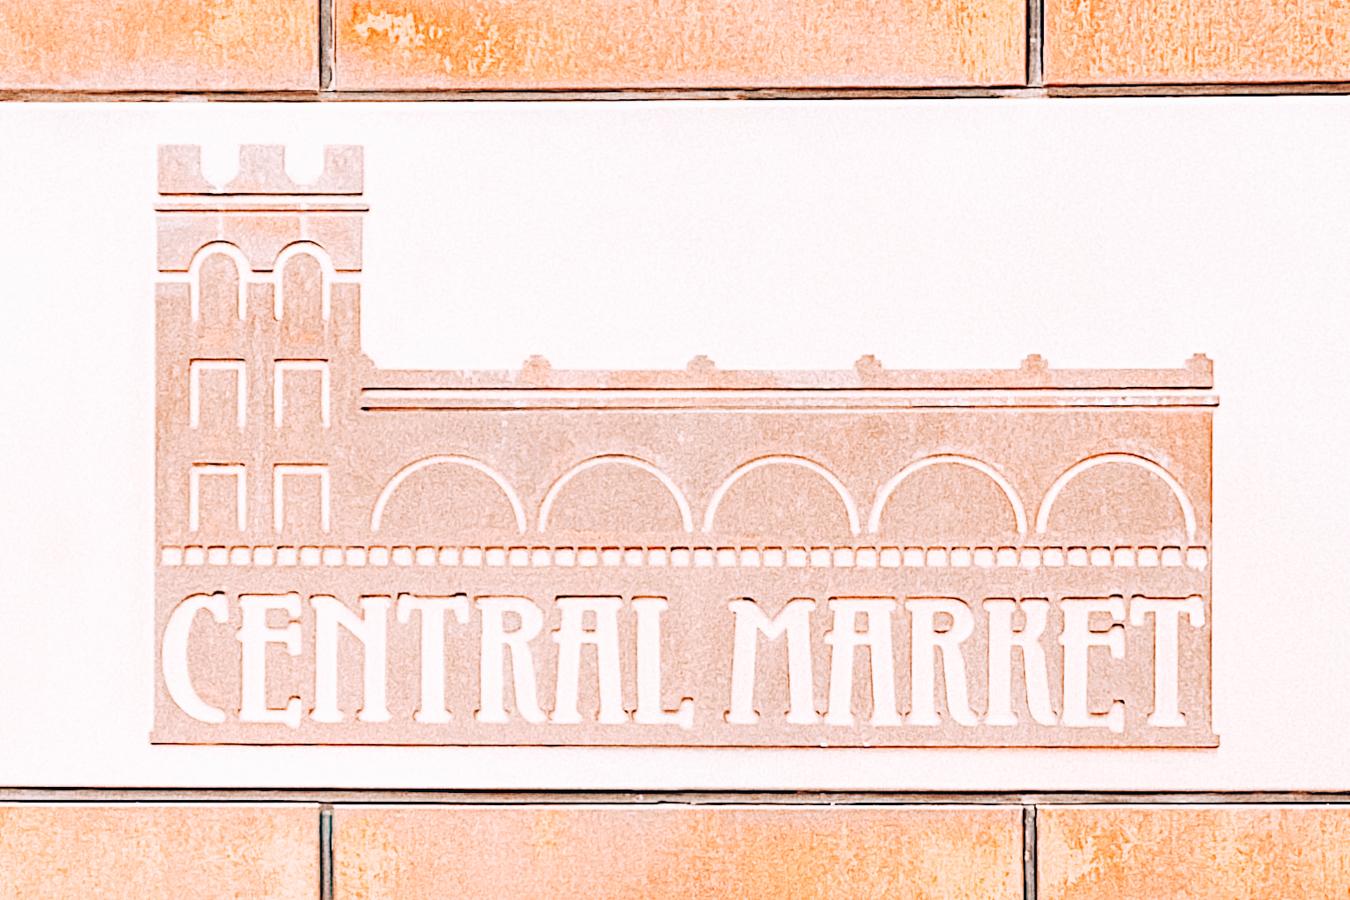 Sign of central market